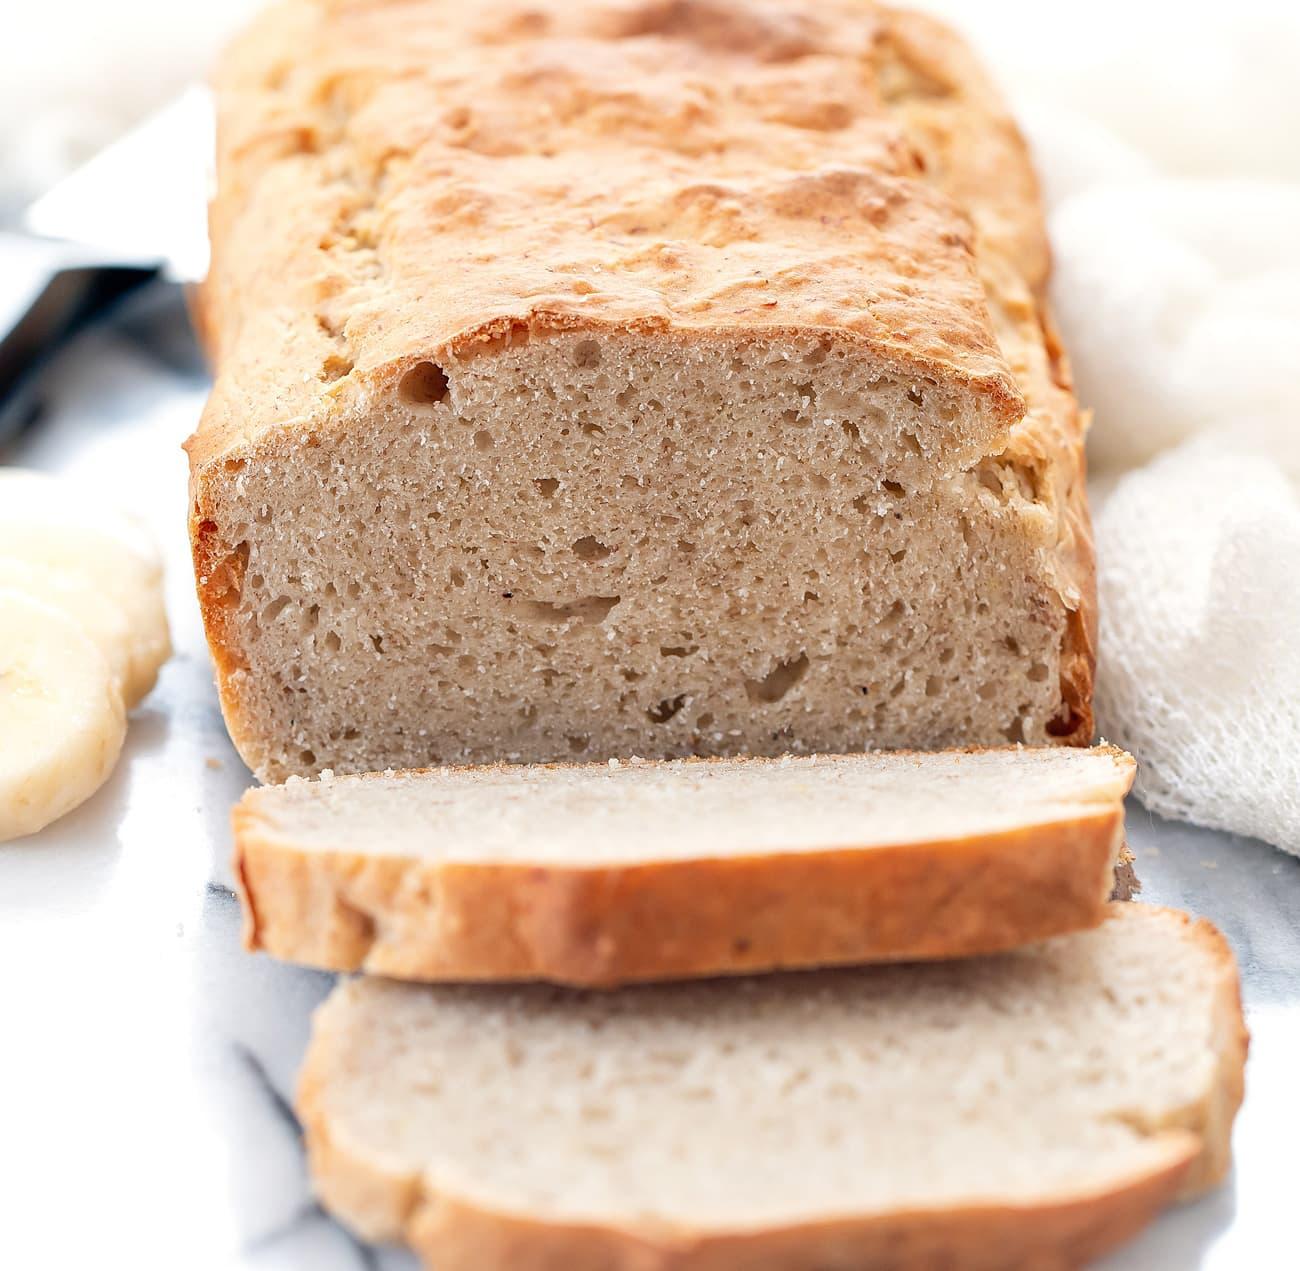 3 Ingredient Banana Bread No Butter Oil Eggs Or Refined Sugar Kirbie S Cravings